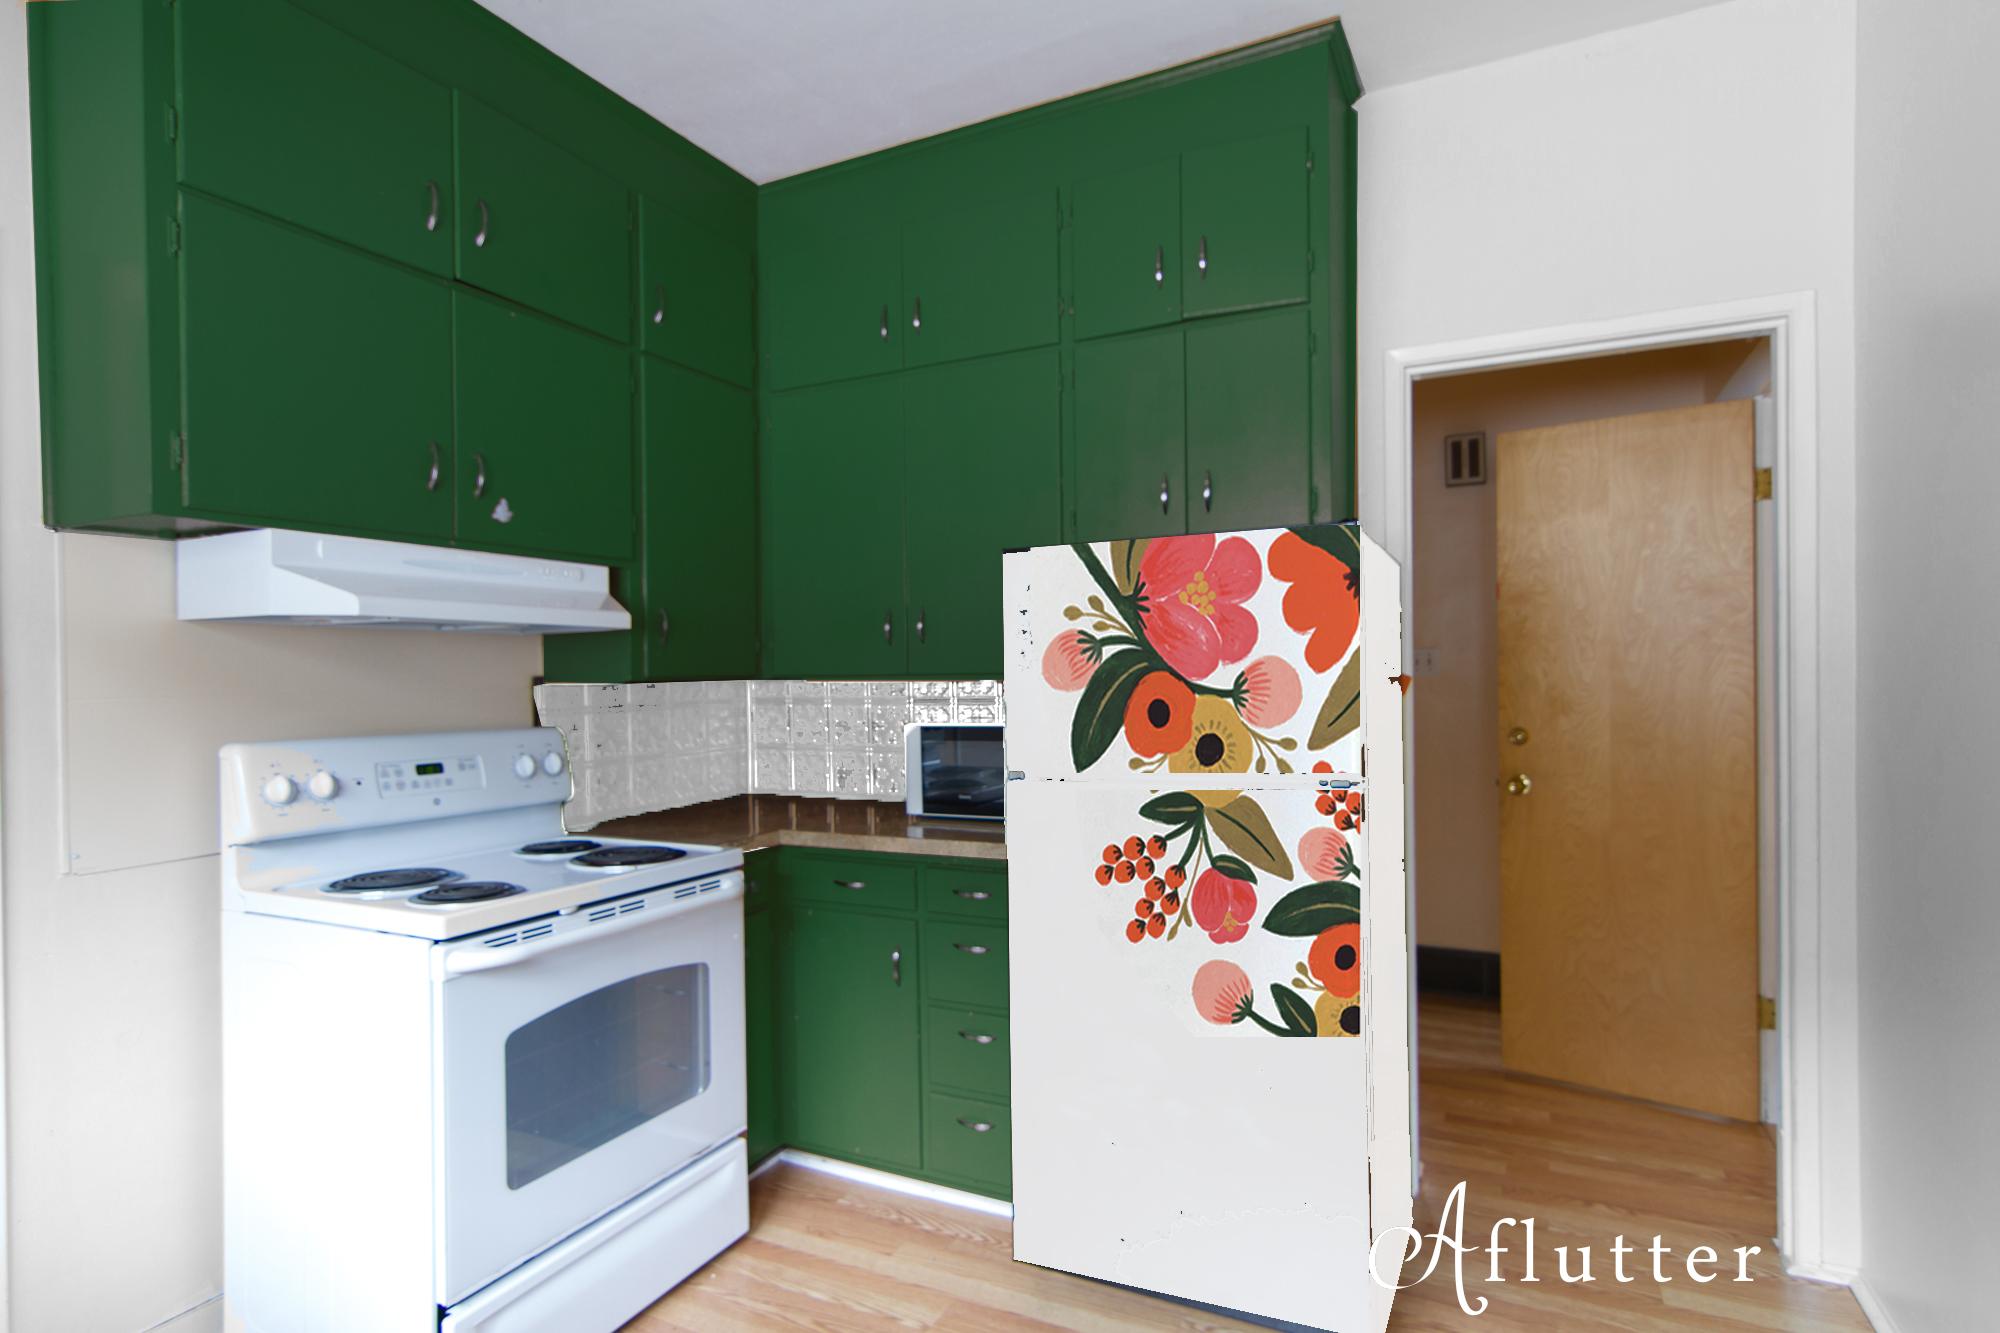 Green-with-floral-fridge.jpg